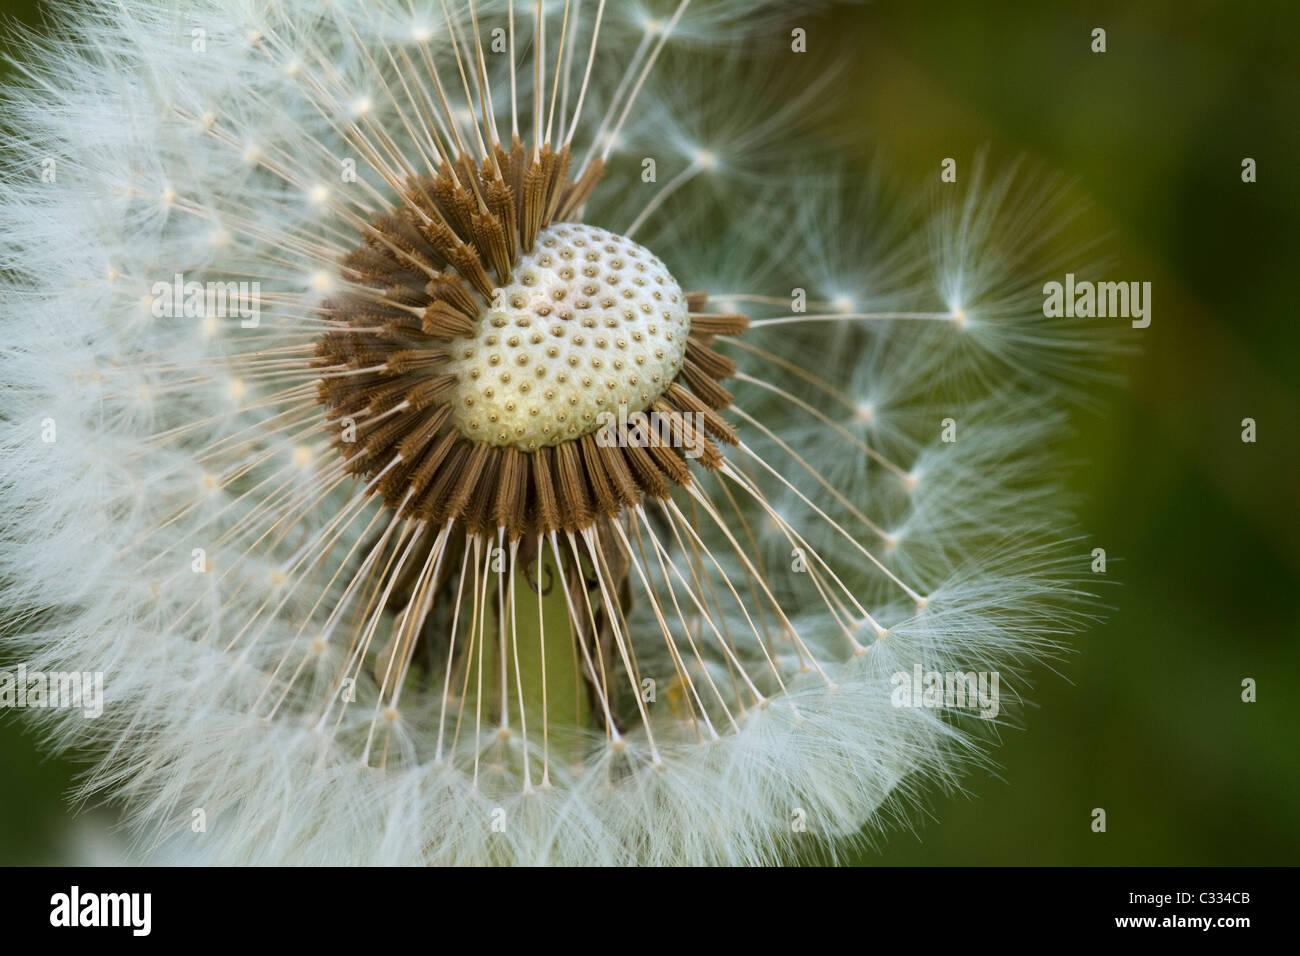 A Macro Photograph of a Dandelion Clock Stock Photo